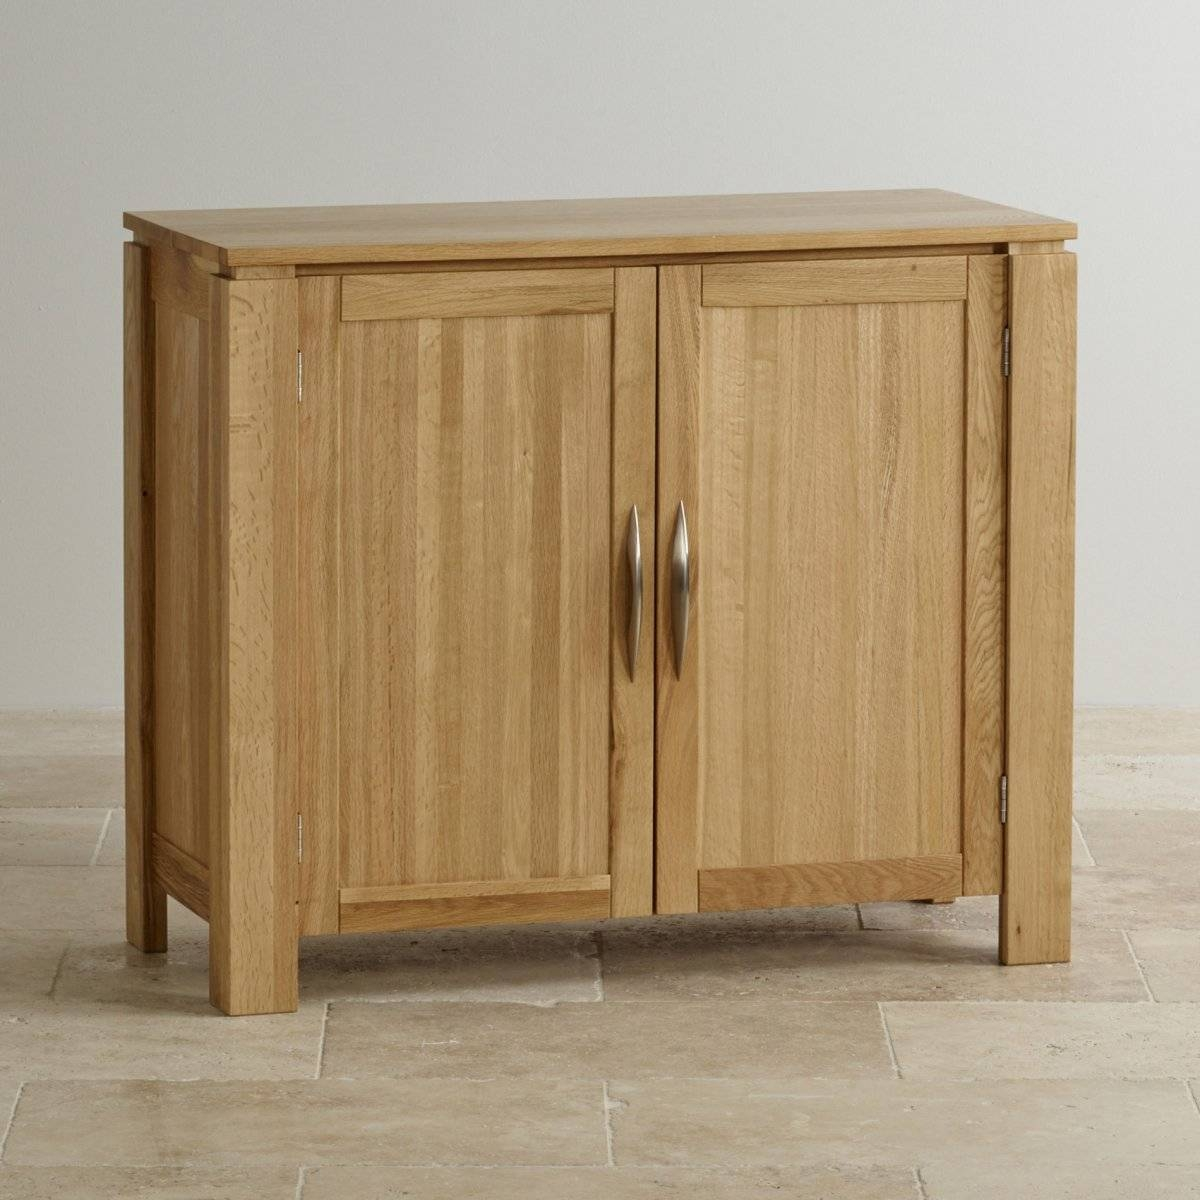 Galway Small Sideboard In Natural Solid Oak | Oak Furniture Land In Narrow Oak Sideboard (#9 of 20)